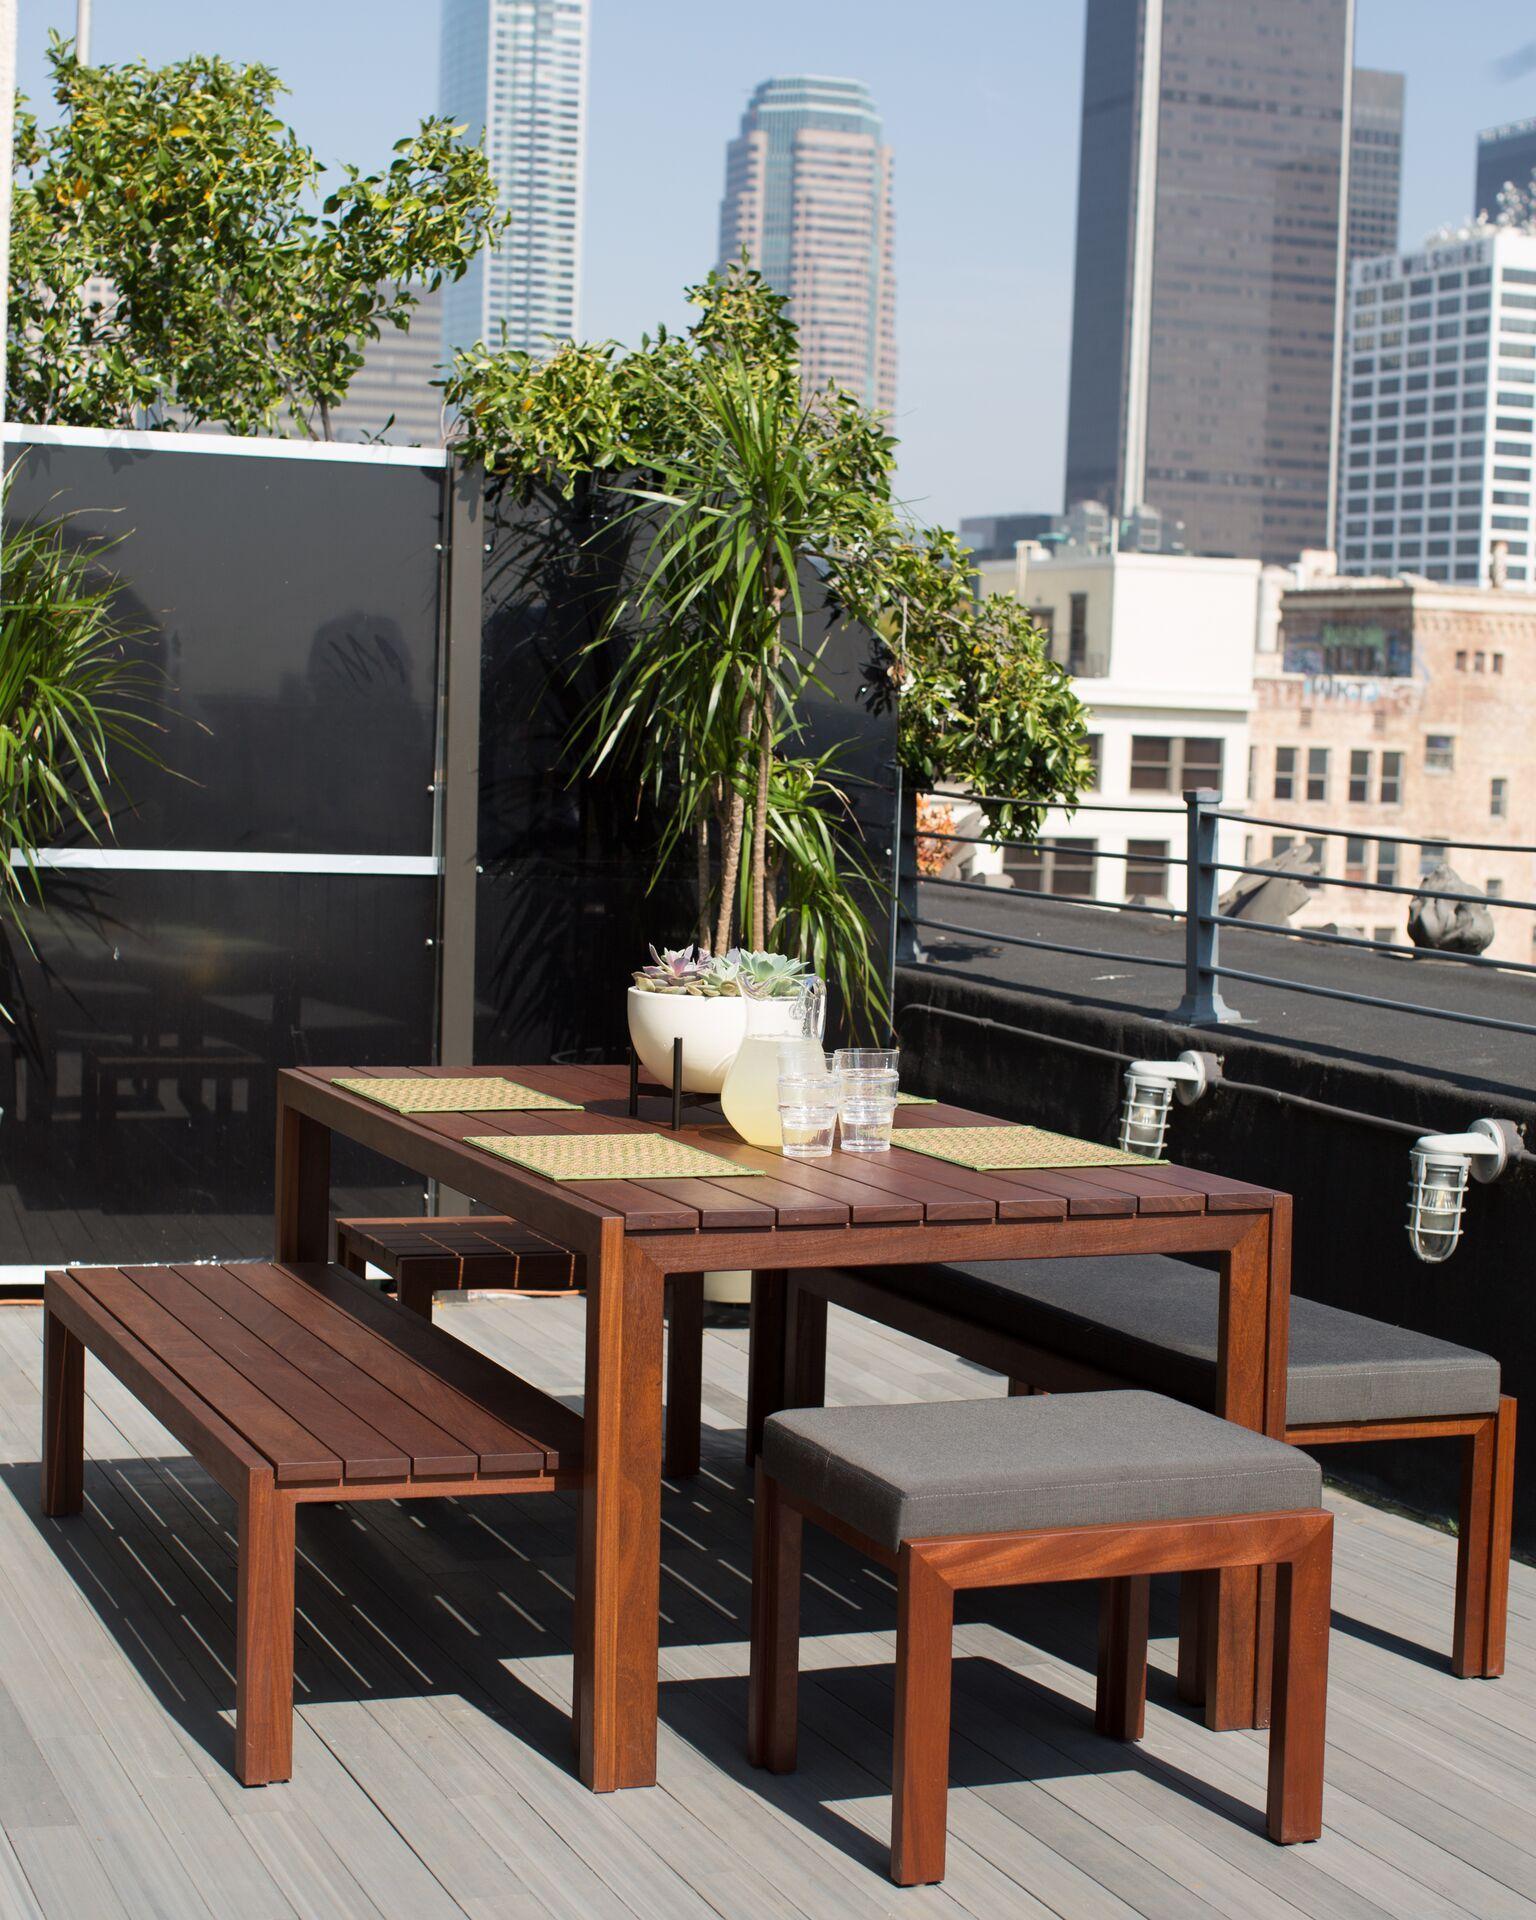 Modernica case study teak furniture